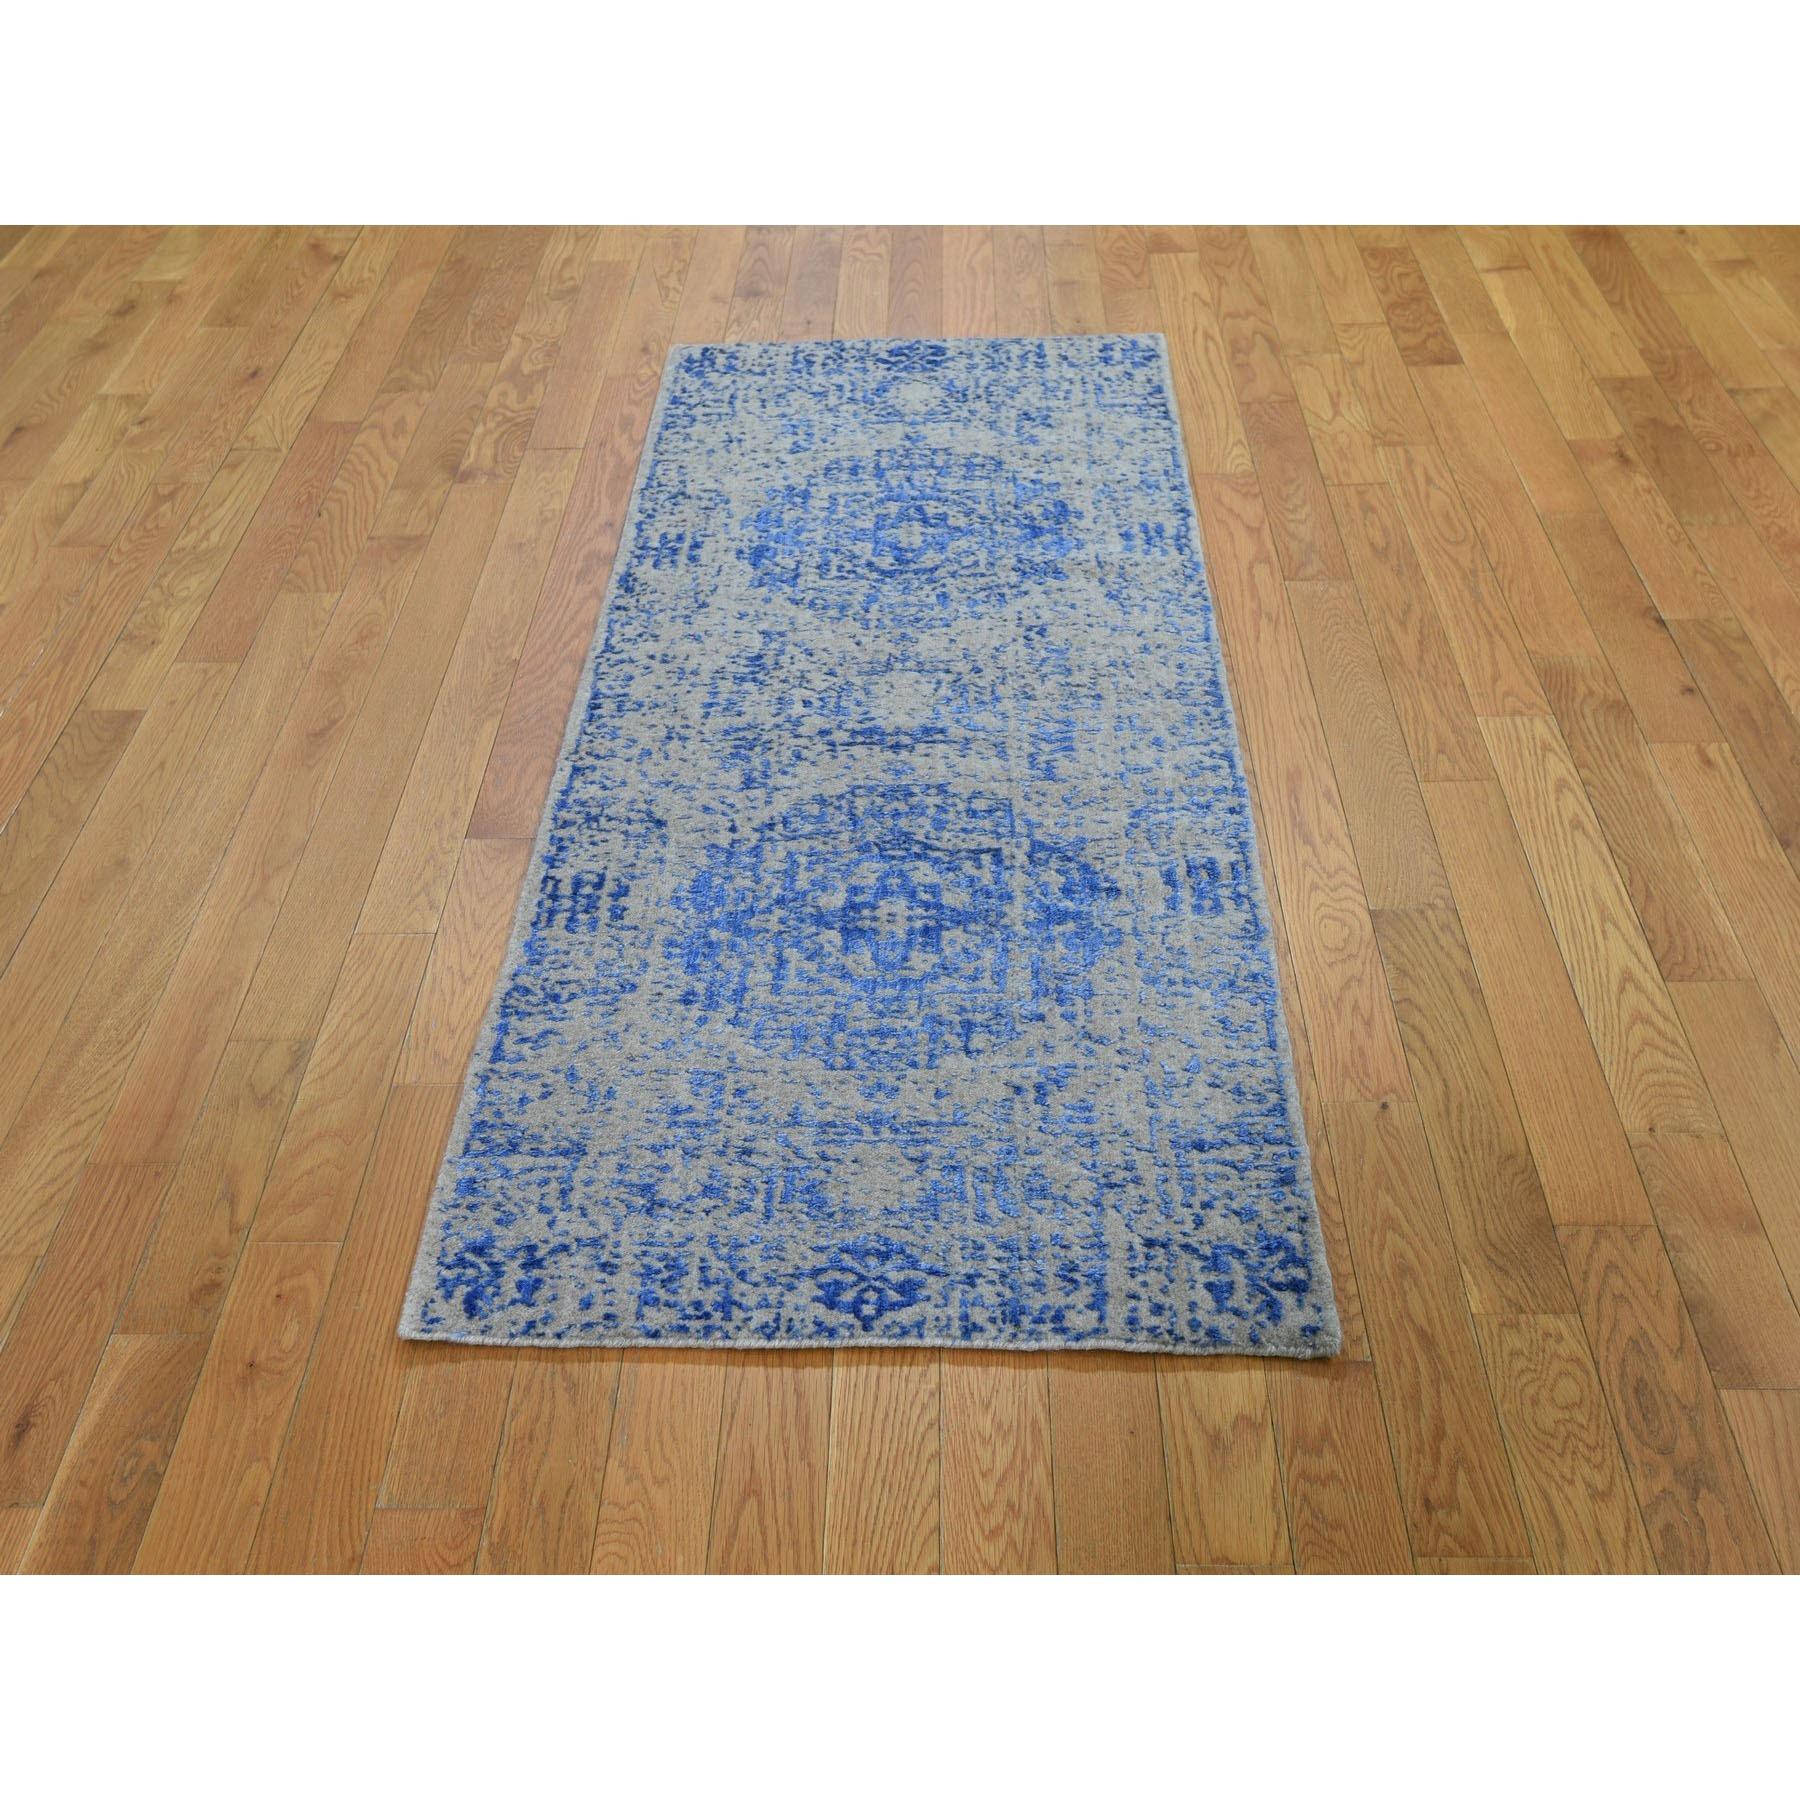 "2'5""x6' Blue Fine jacquard Mamluk Design Hand loomed Wool And Art Silk Runner Oriental Rug"